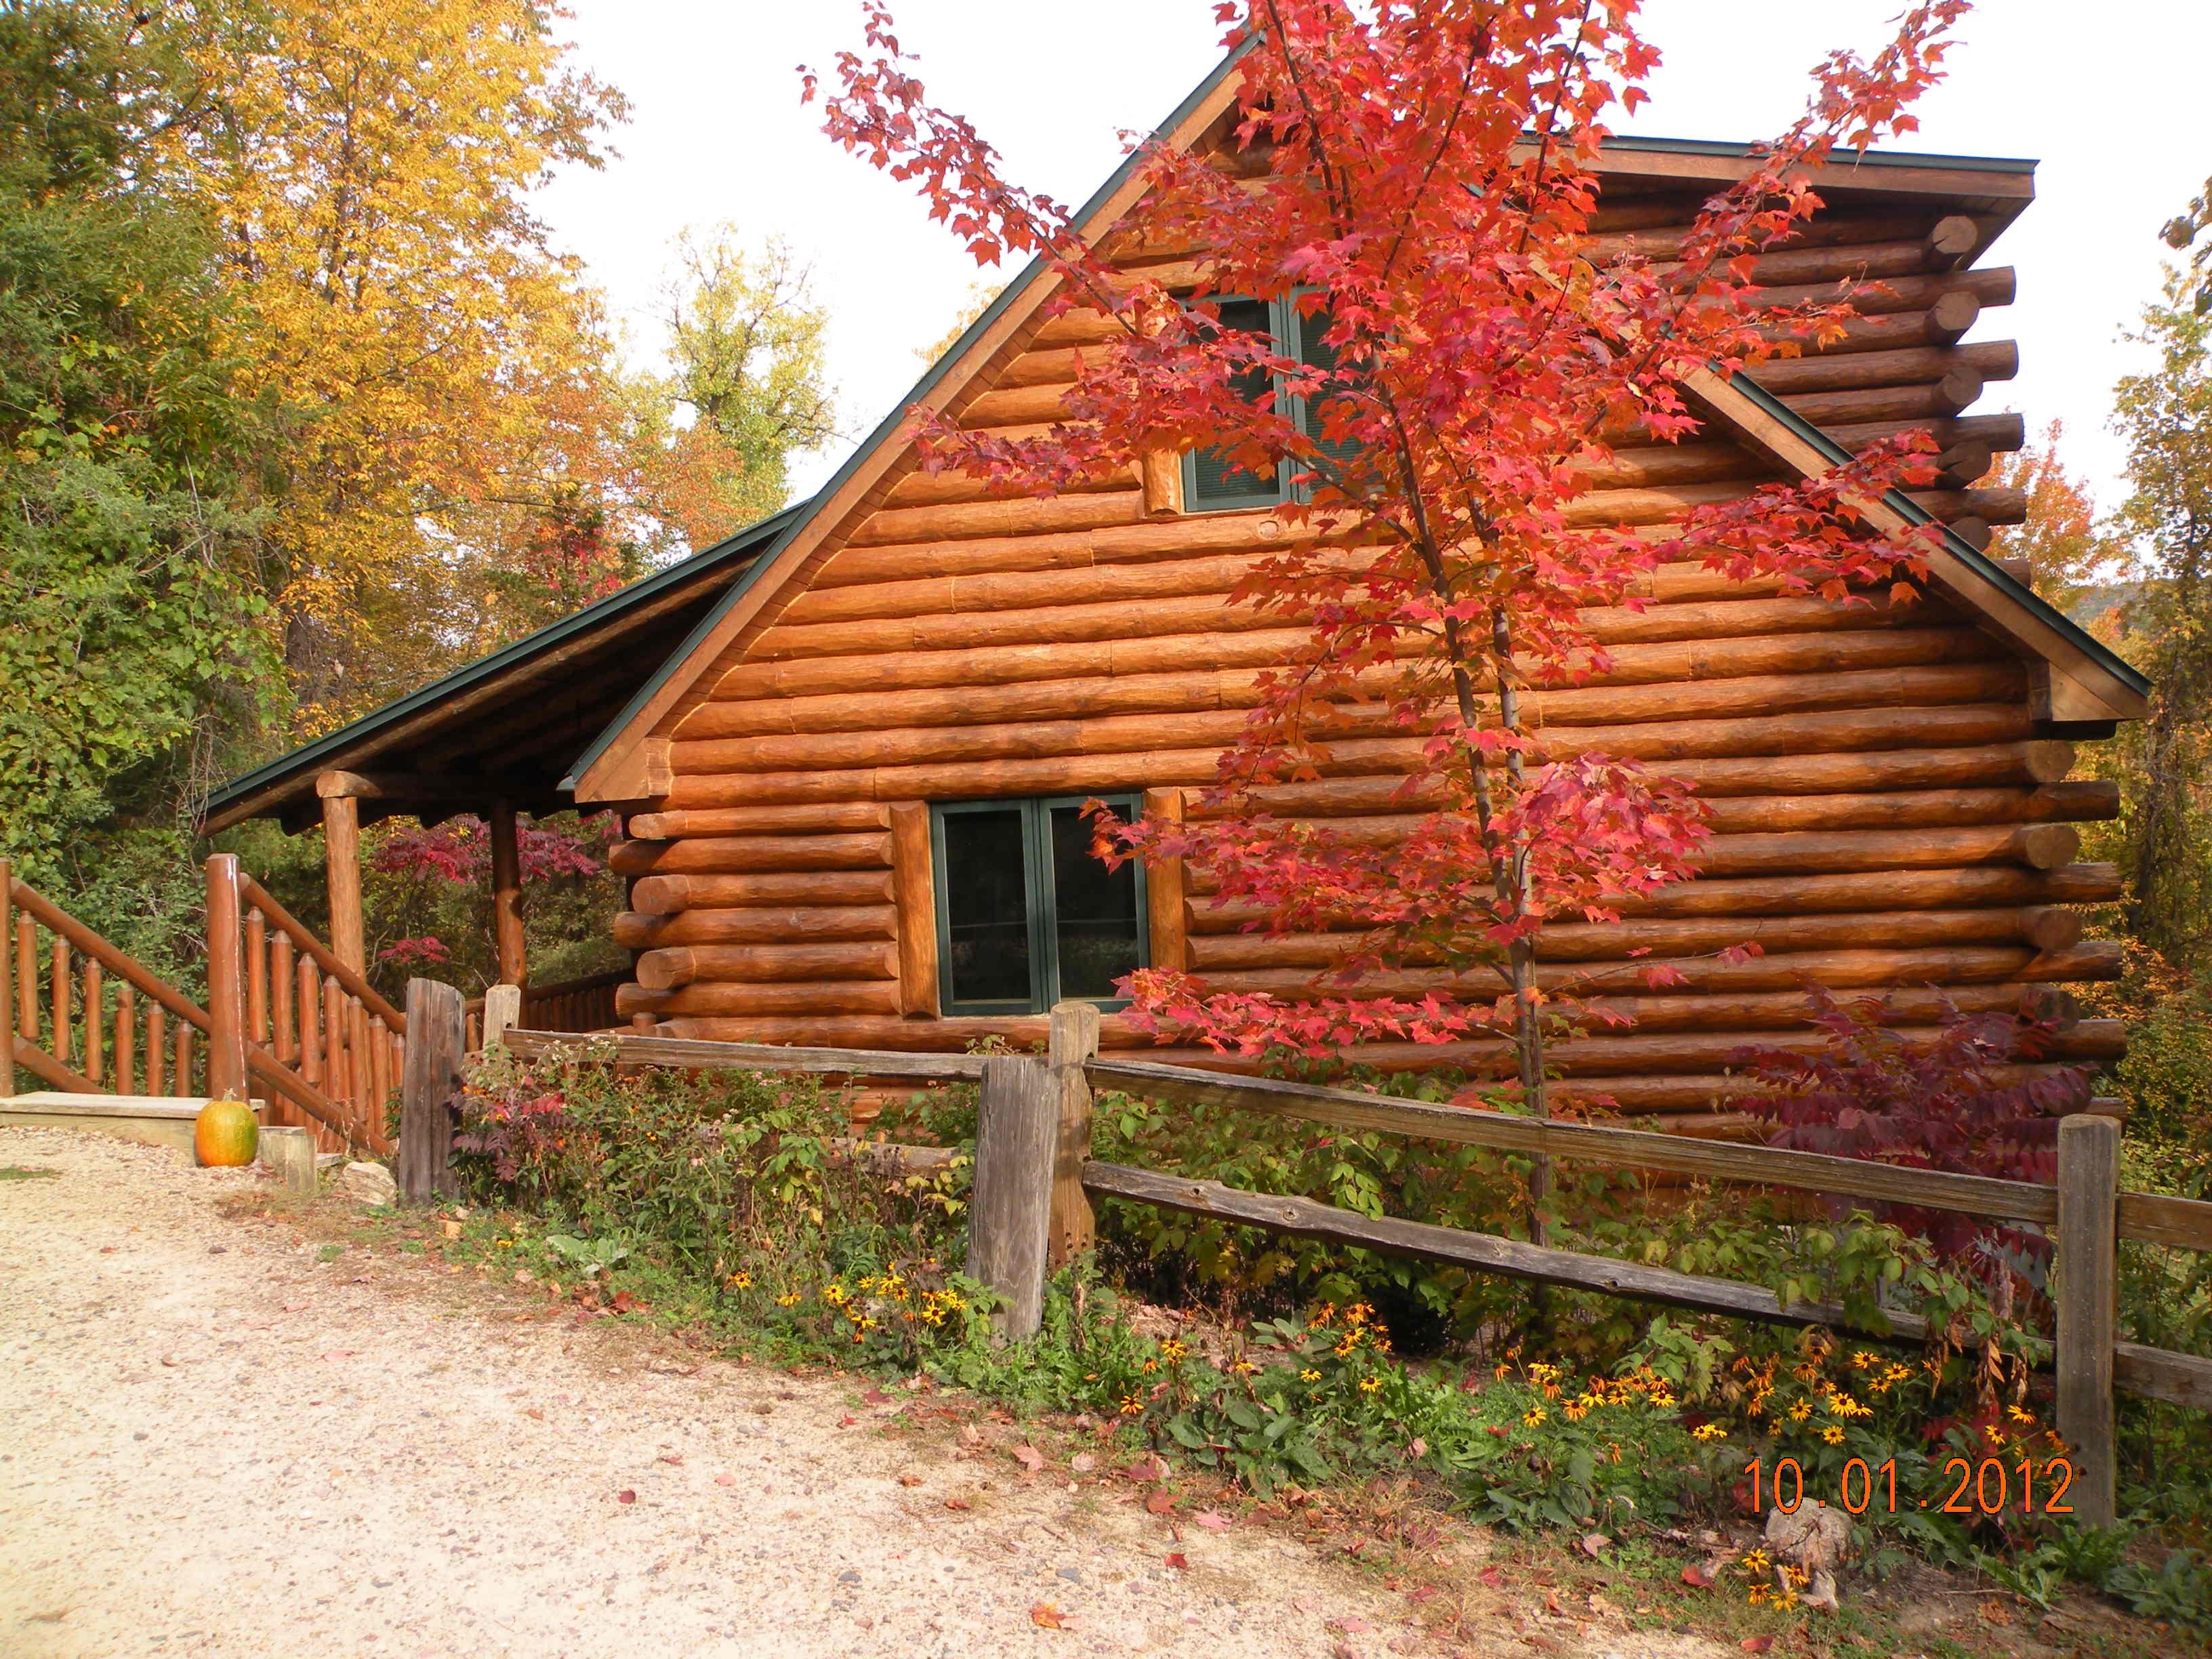 Rustic Ridge Cabin 3 | Rustic Ridge Log Cabins